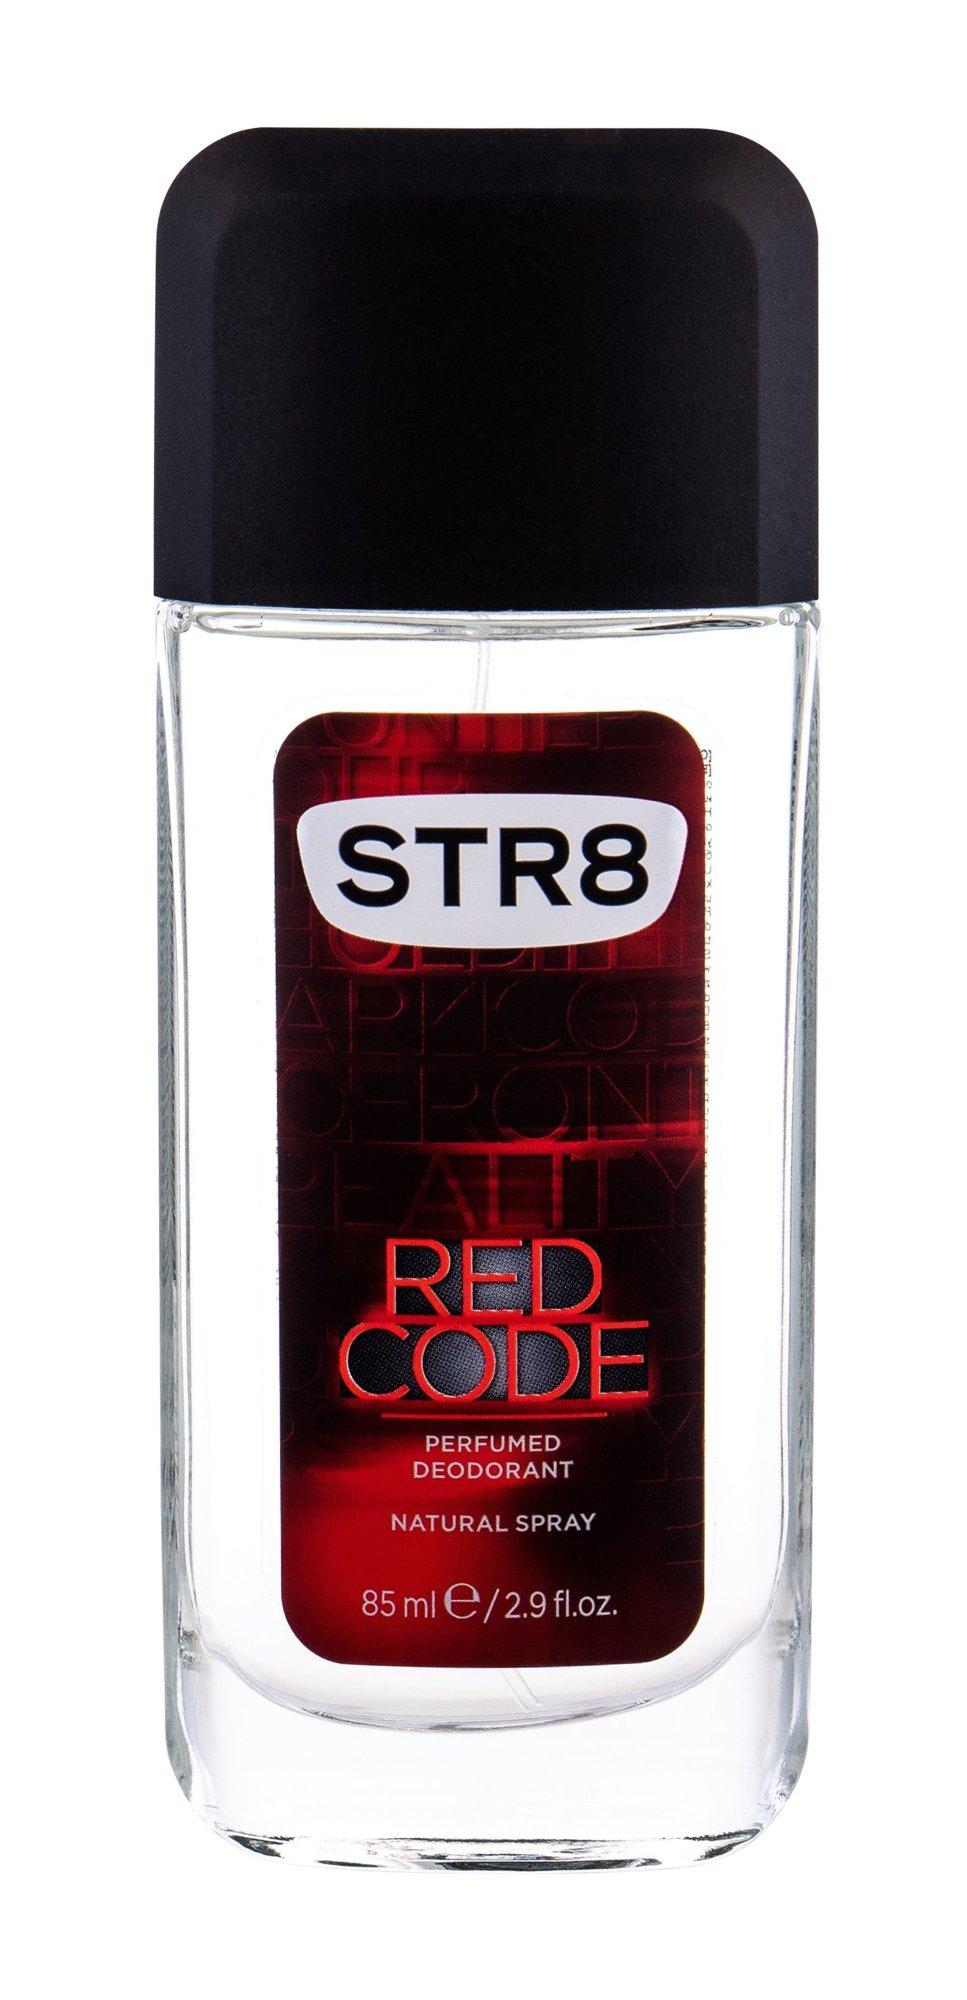 STR8 Red Code Deodorant 85ml